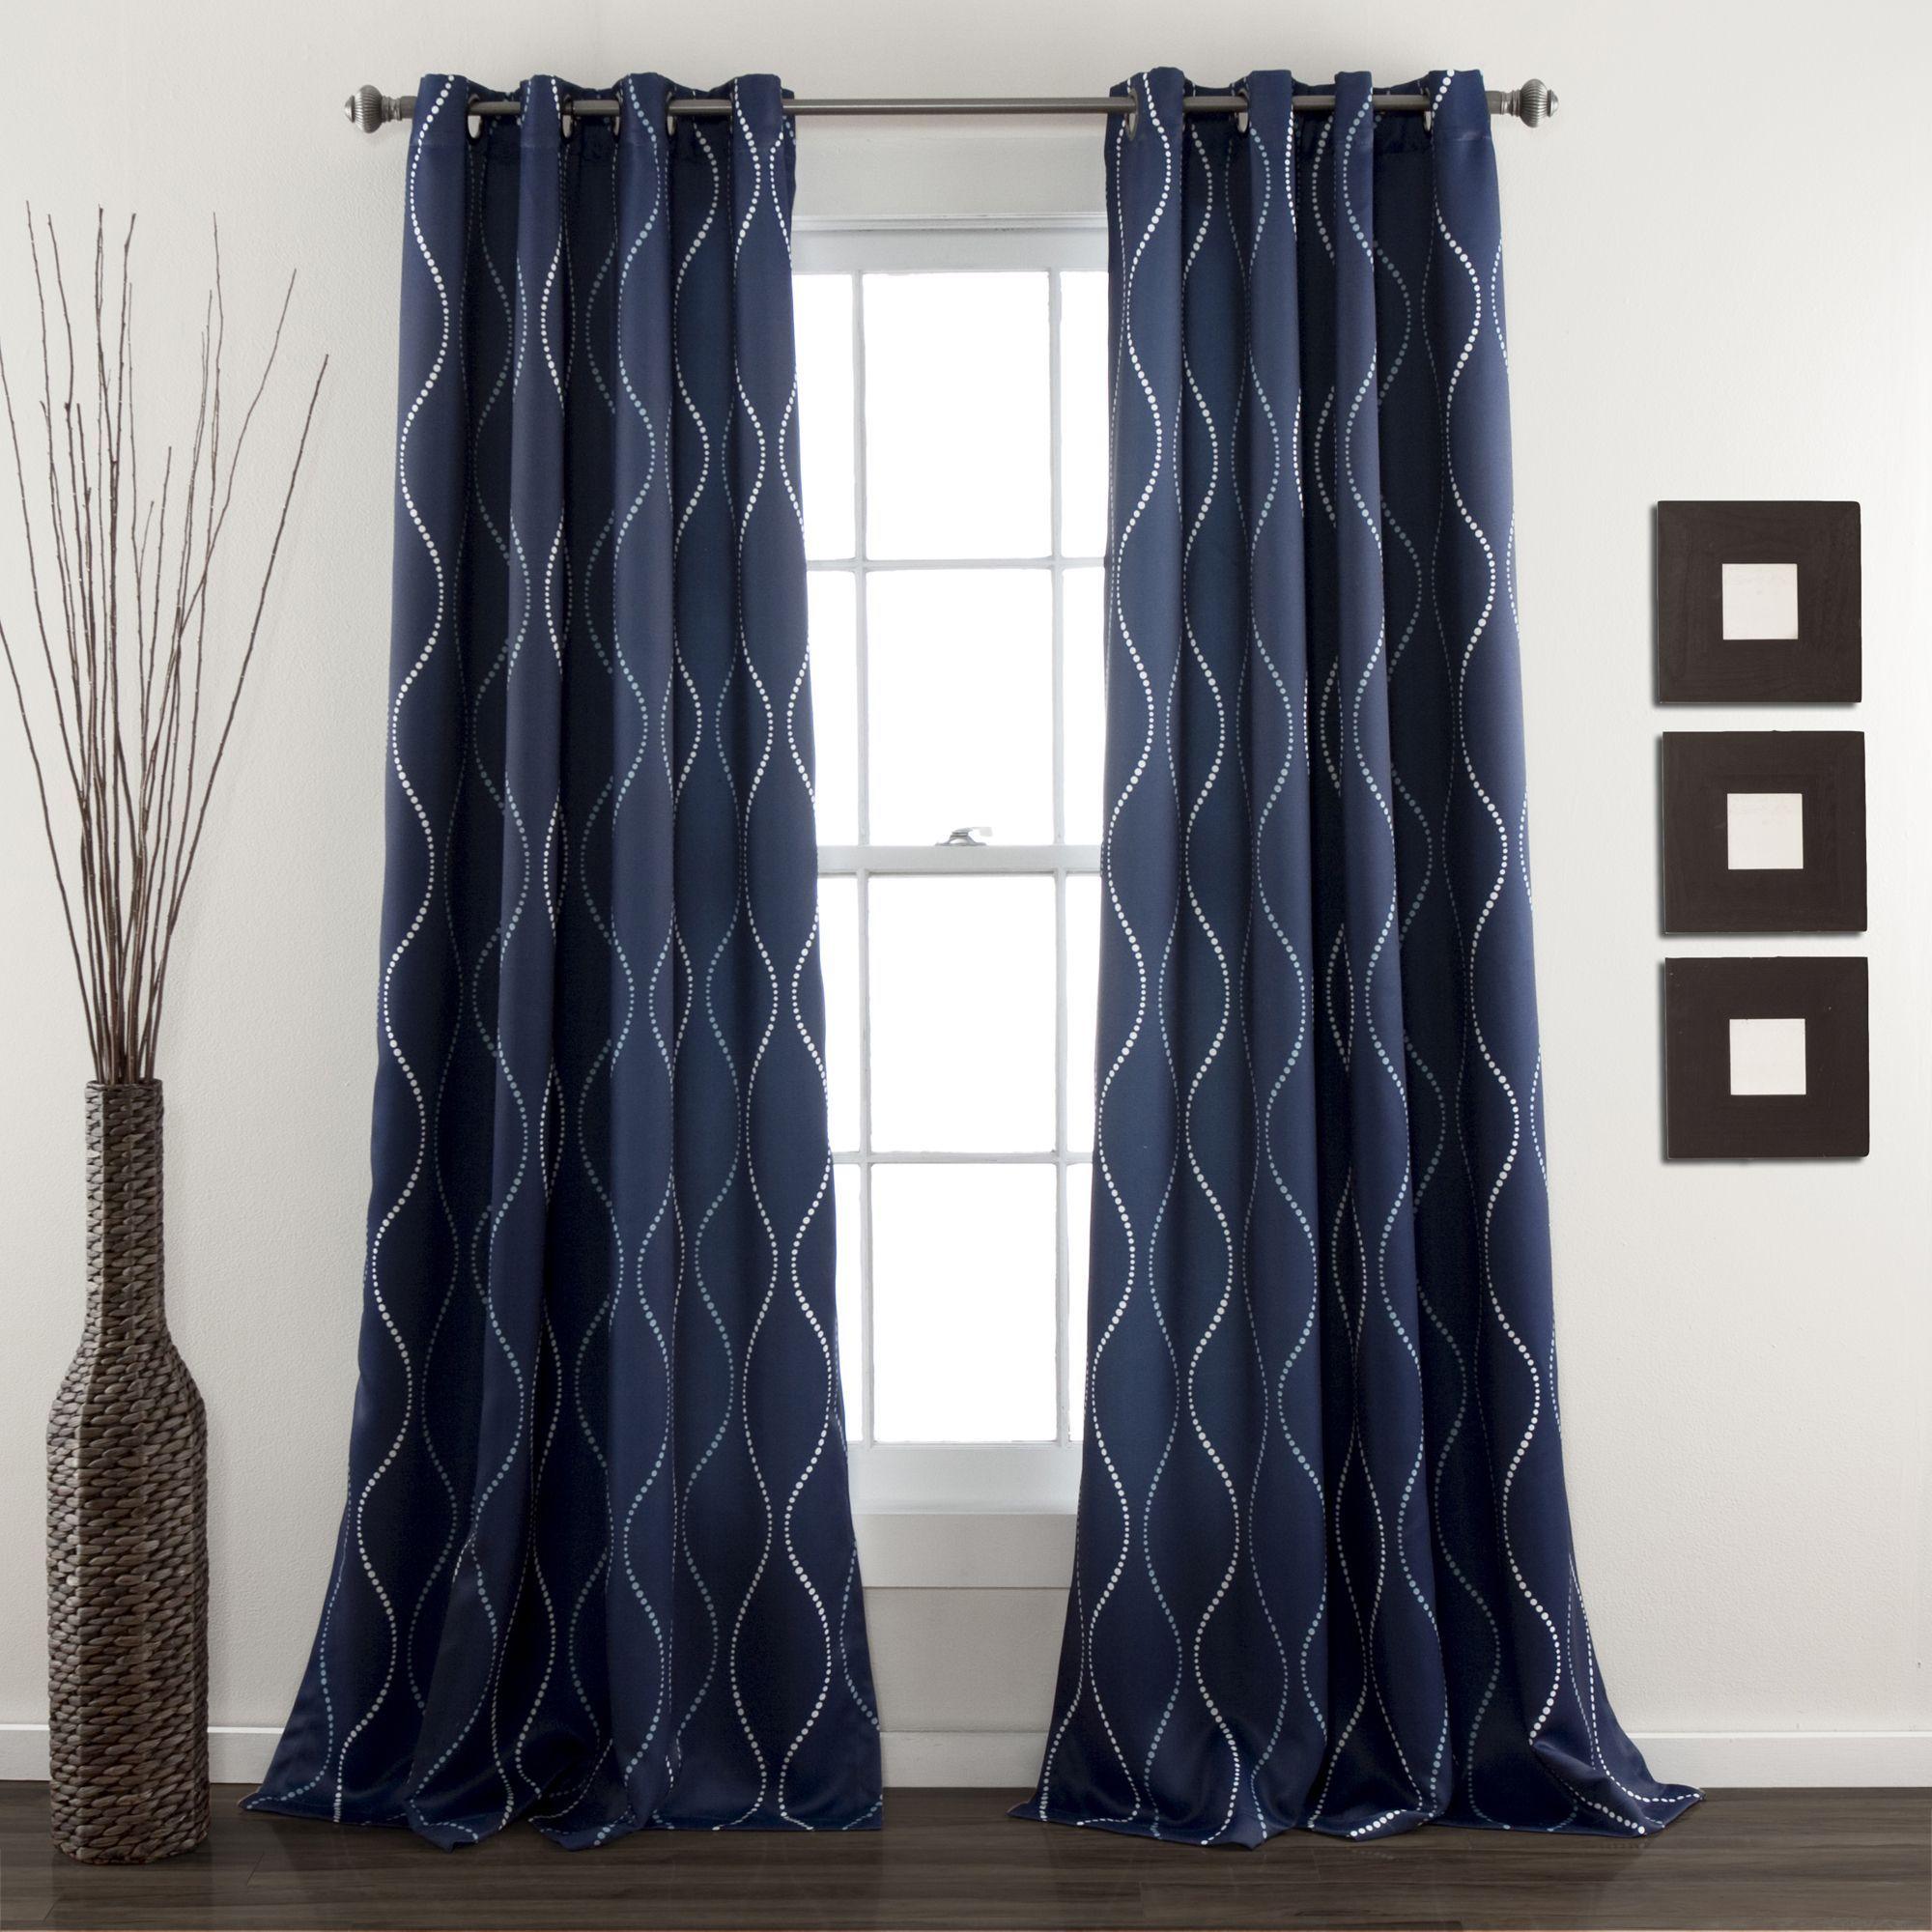 Lush Decor Swirl Blackout Curtain Panel Pair Overstock Shopping